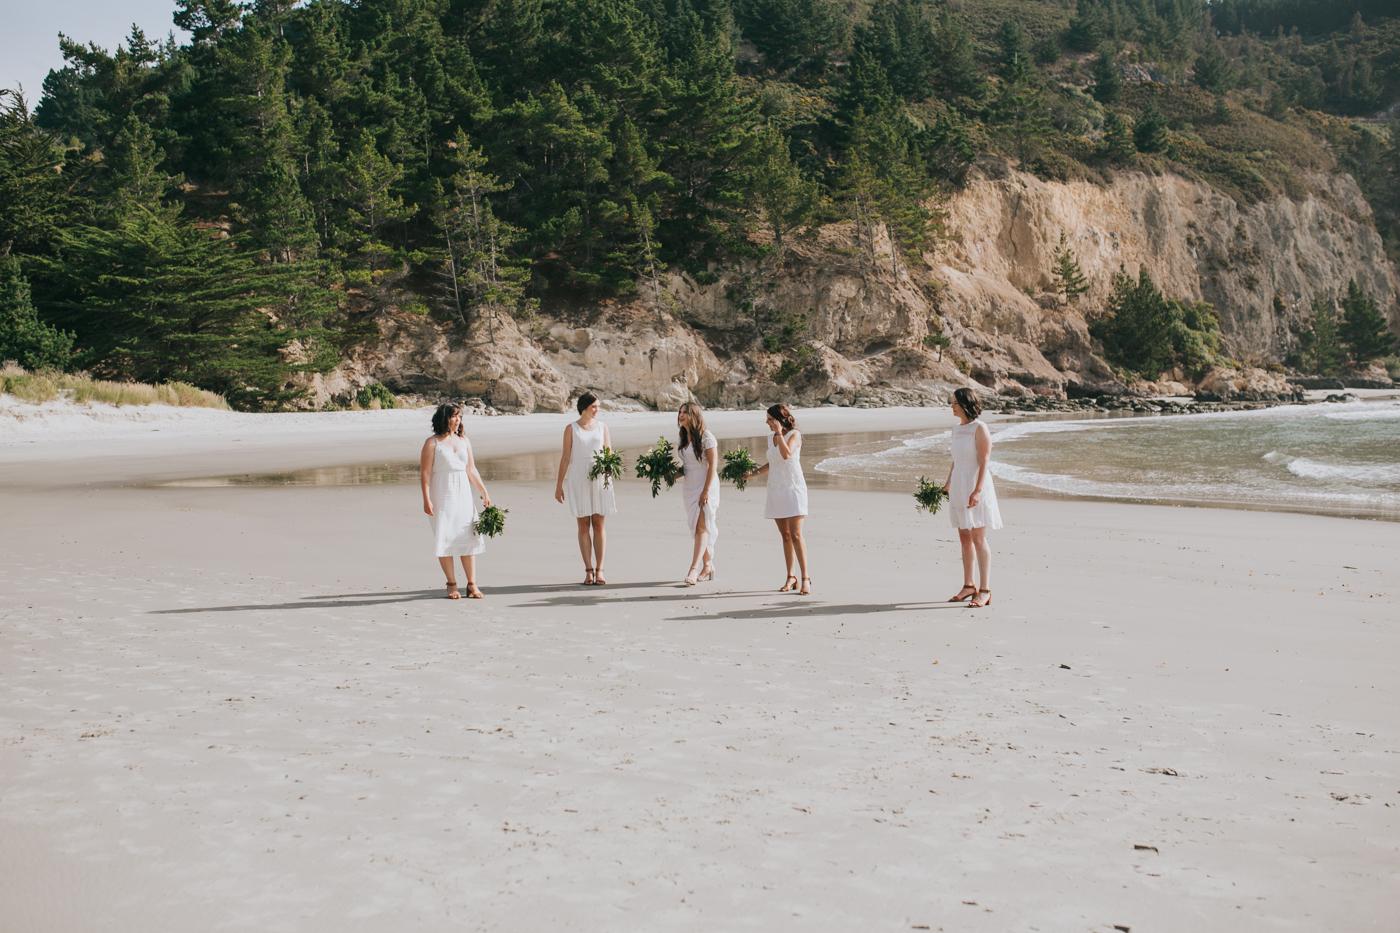 Ariana & Tim - Dunedin, New Zealand Wedding - Destination Wedding - Samantha Heather Photography-129.jpg